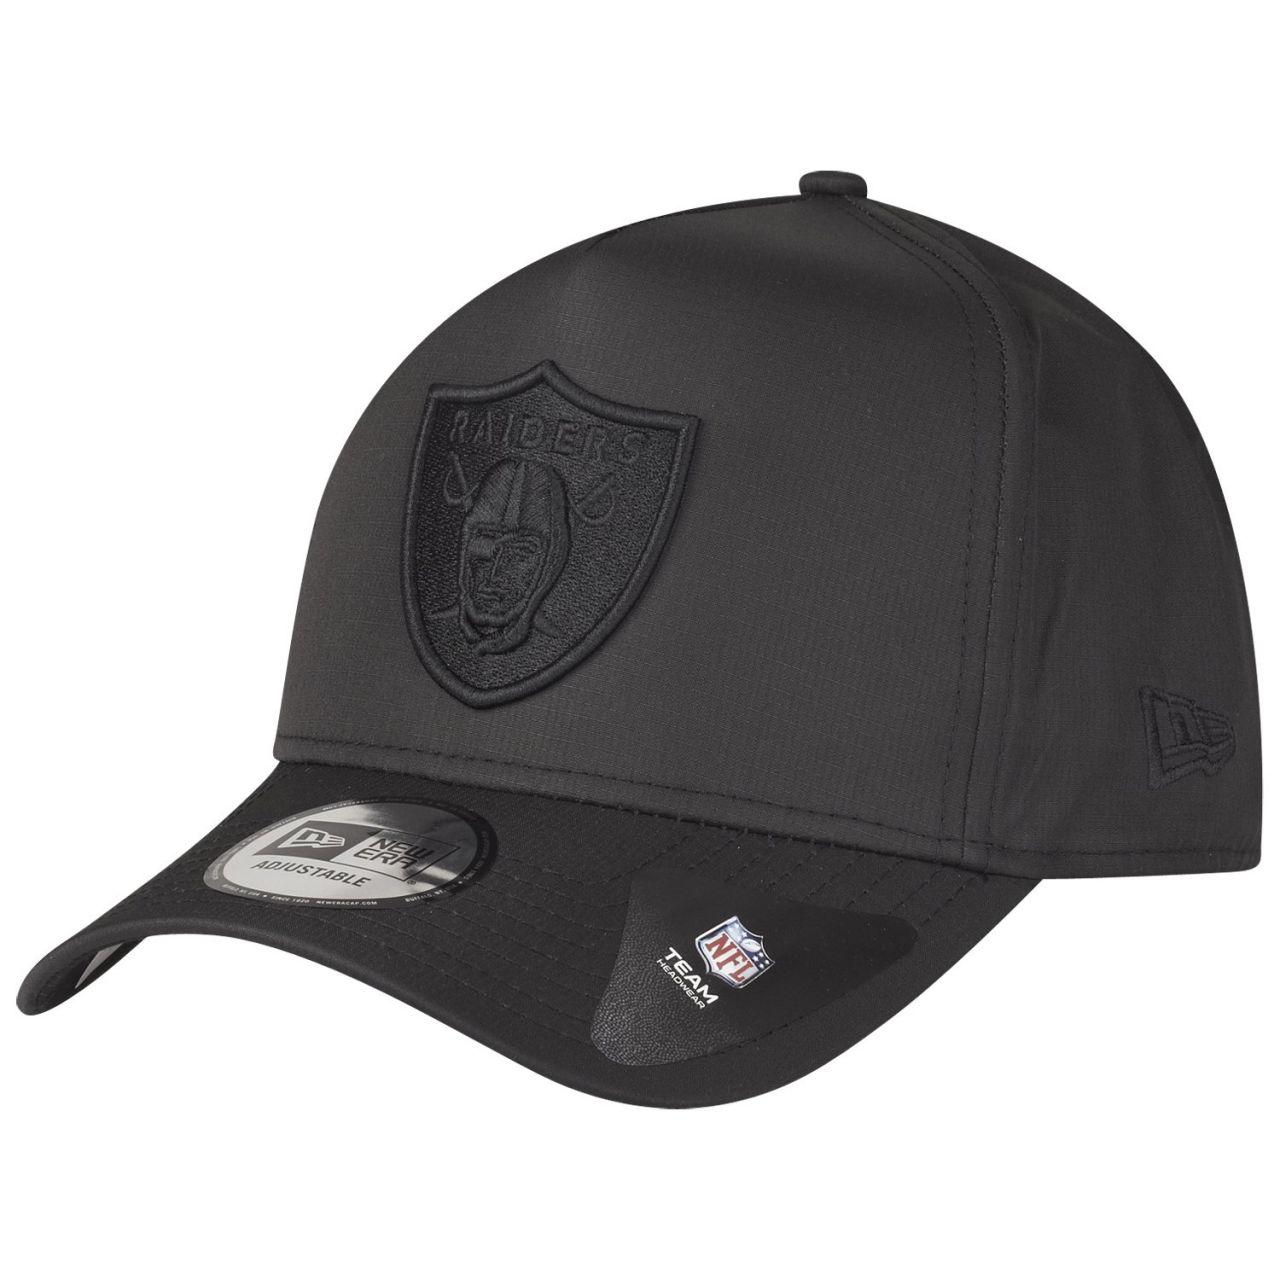 amfoo - New Era A-Frame Ripstop Trucker Cap - NFL Las Vegas Raiders